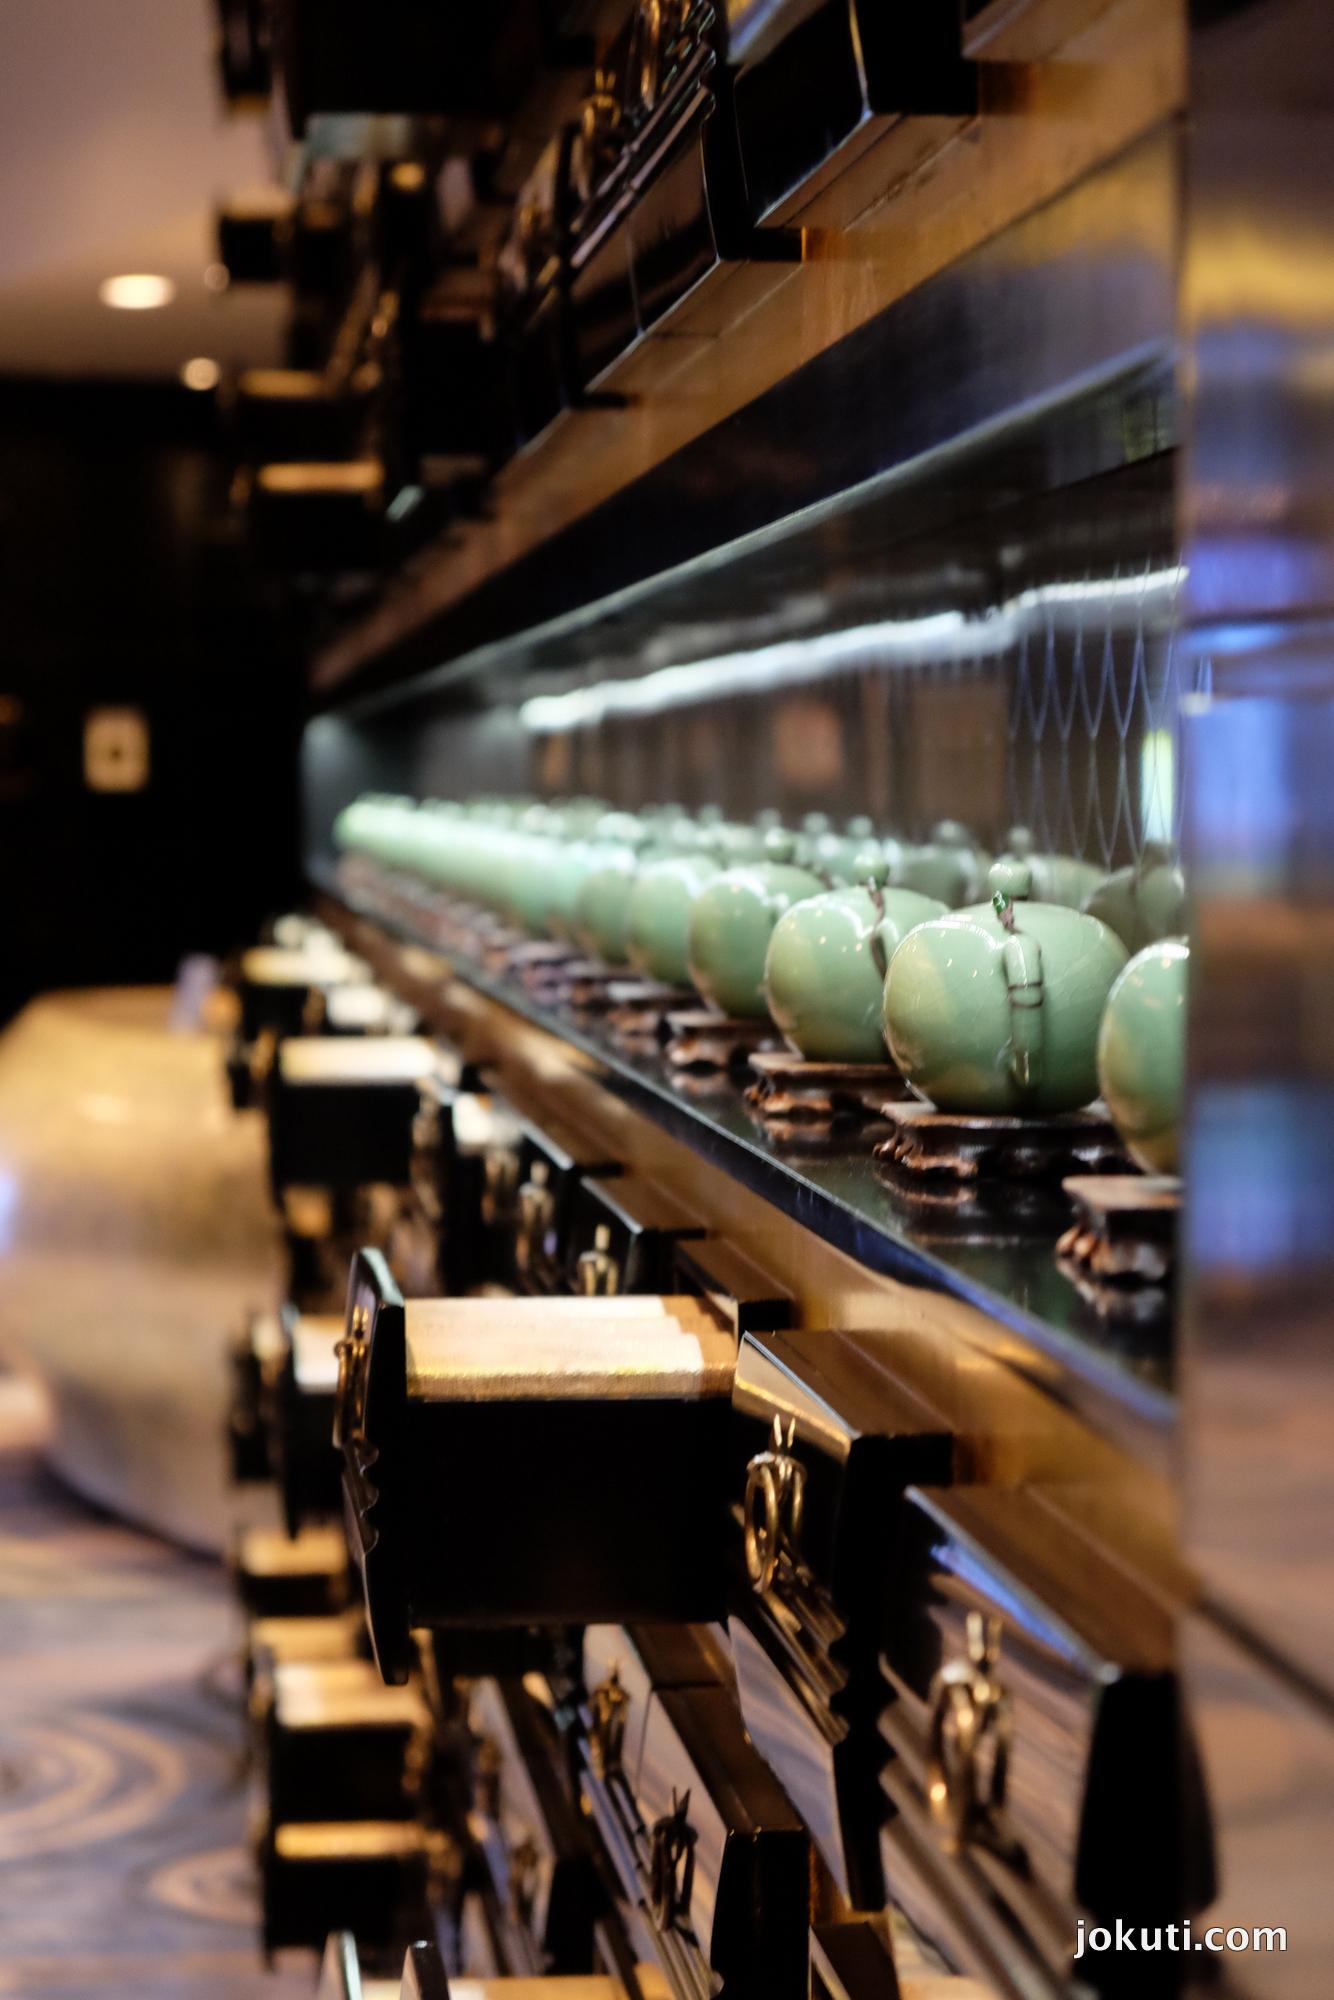 dscf6805_macau_makao_china_kinai_vilagevo_jokuti_jade_dragon_restaurant_cantonese_chinese_michelin_macau_makao_china_kinai_vilagevo_jokuti.jpg